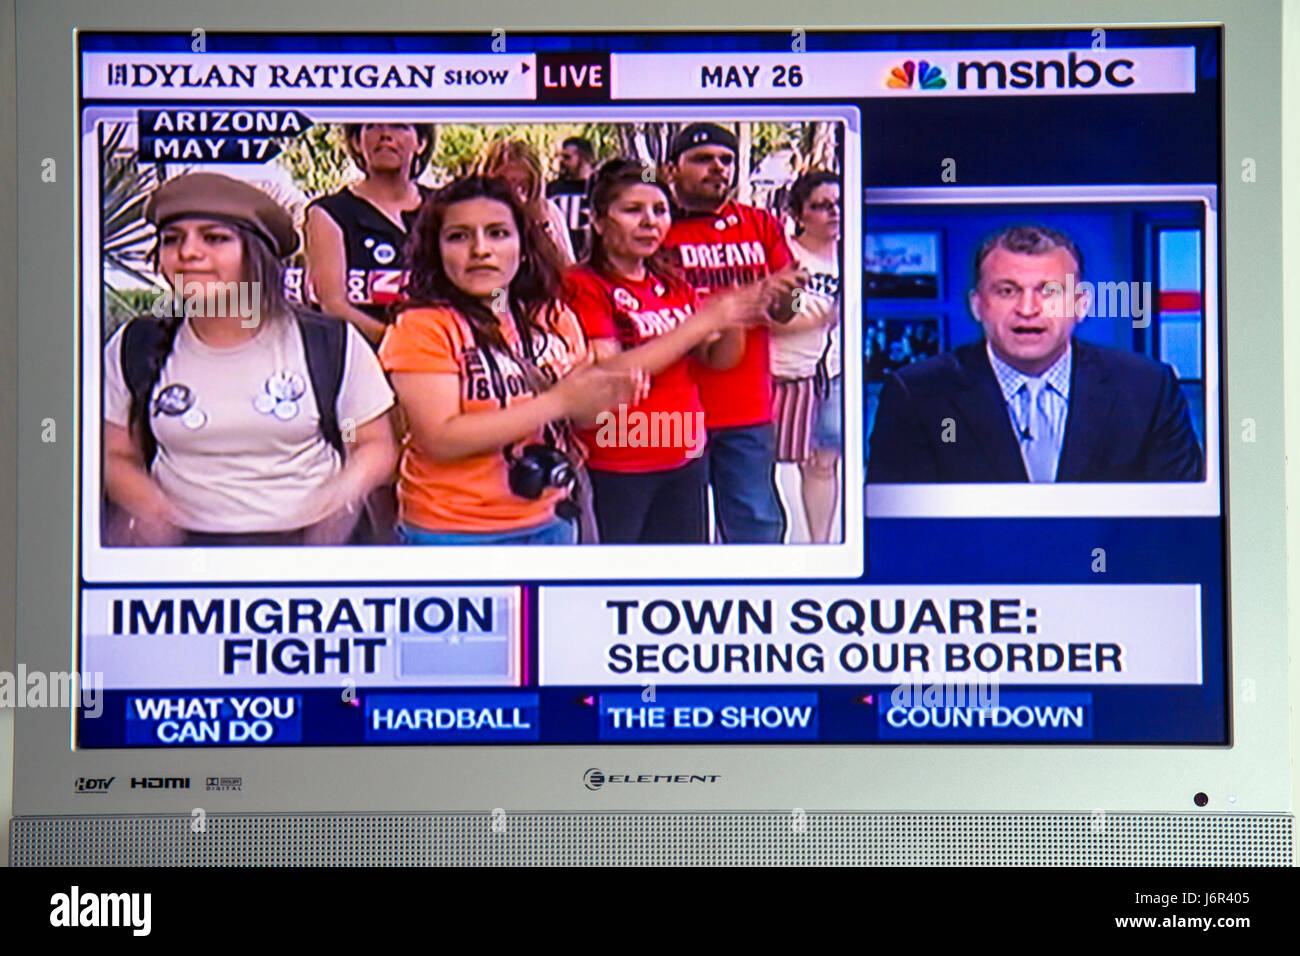 MSNBC Arizona Immigration Law illegal immigrants immigration Mexico border TV television screen flat panel - Stock Image